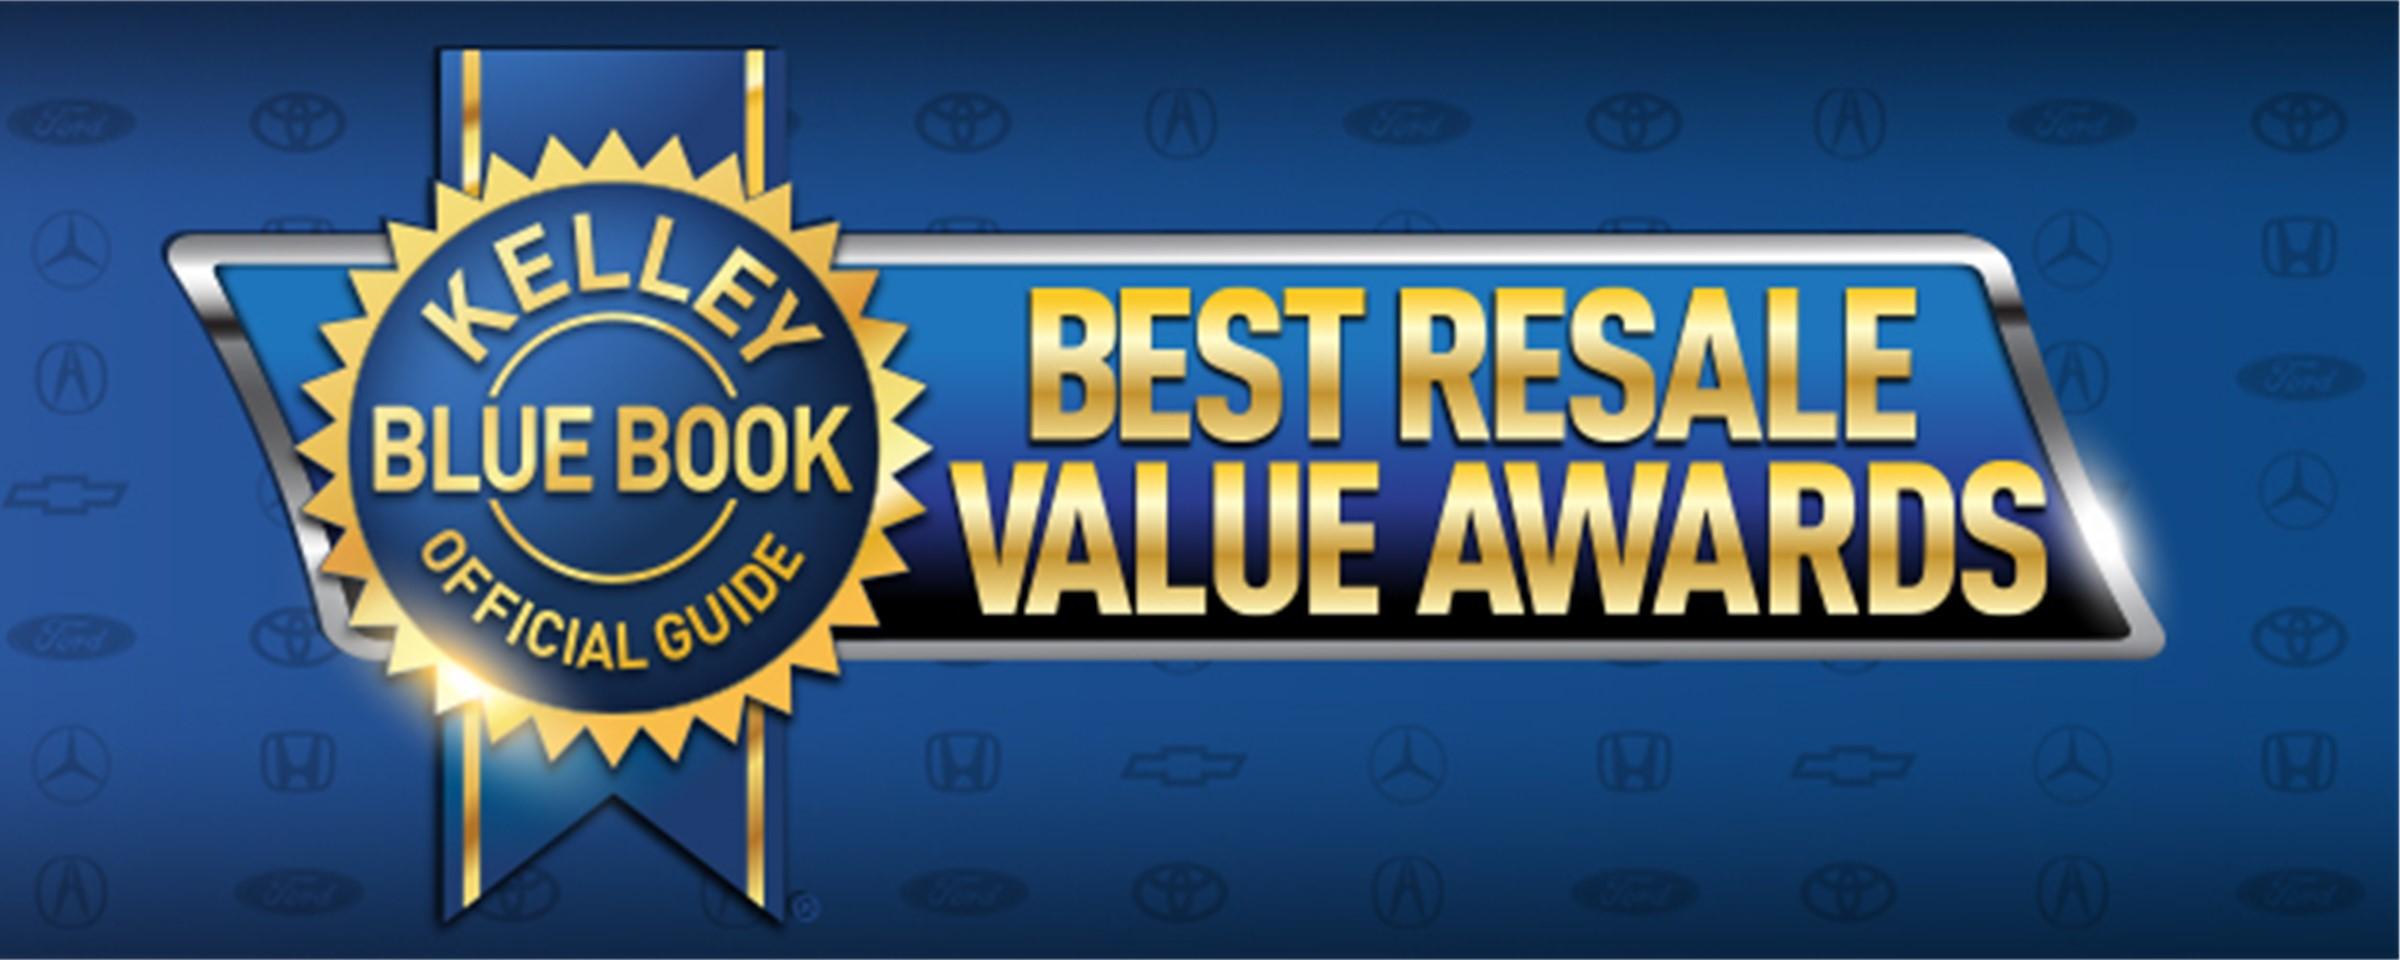 Blue Book Value